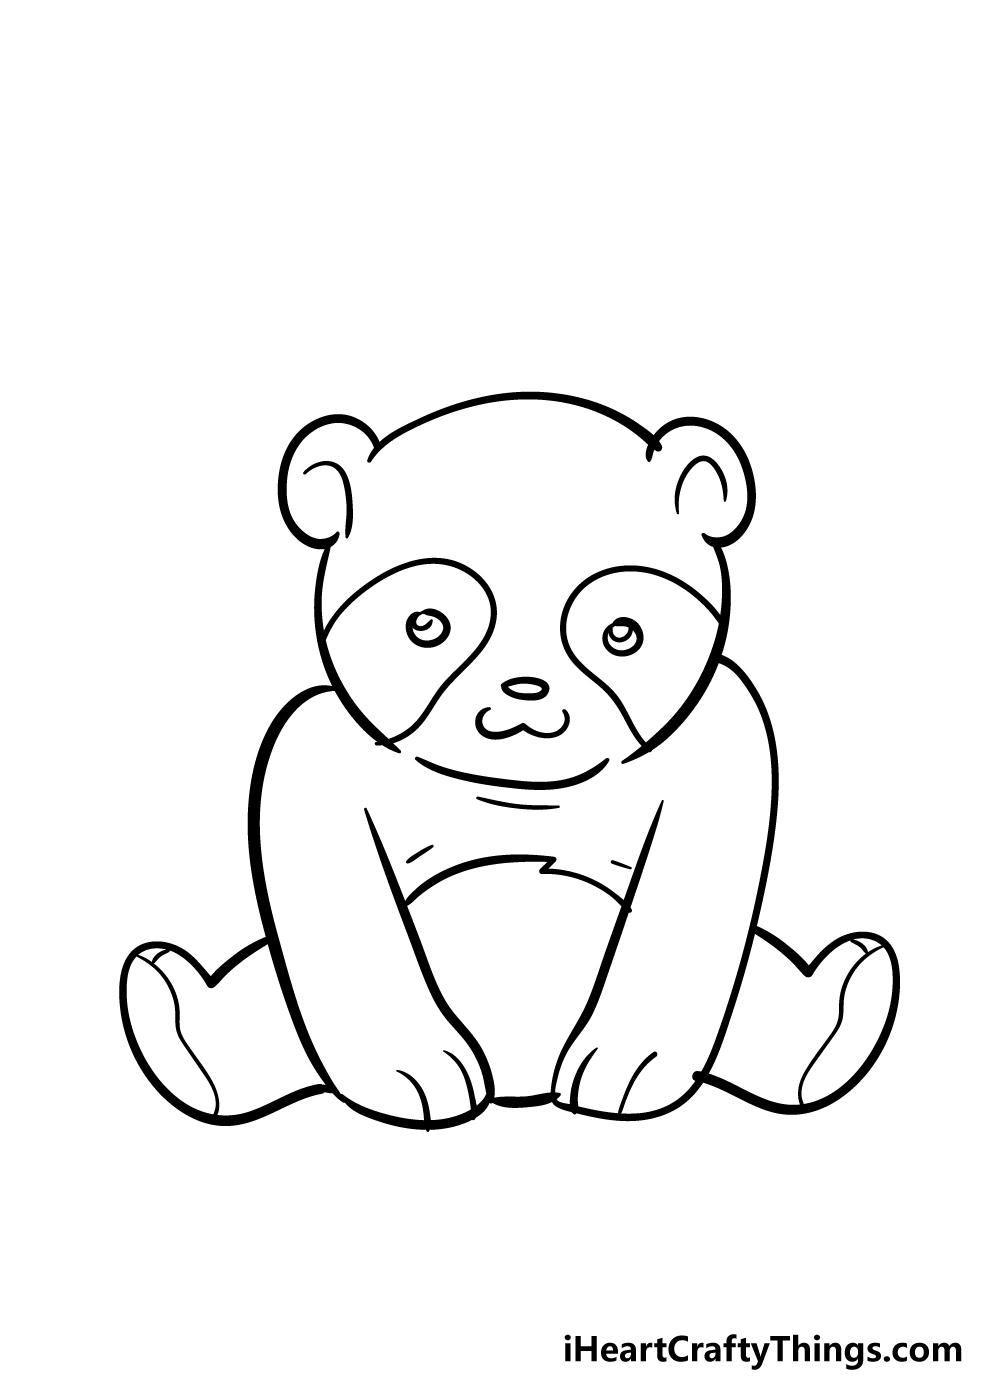 panda drawing step 6